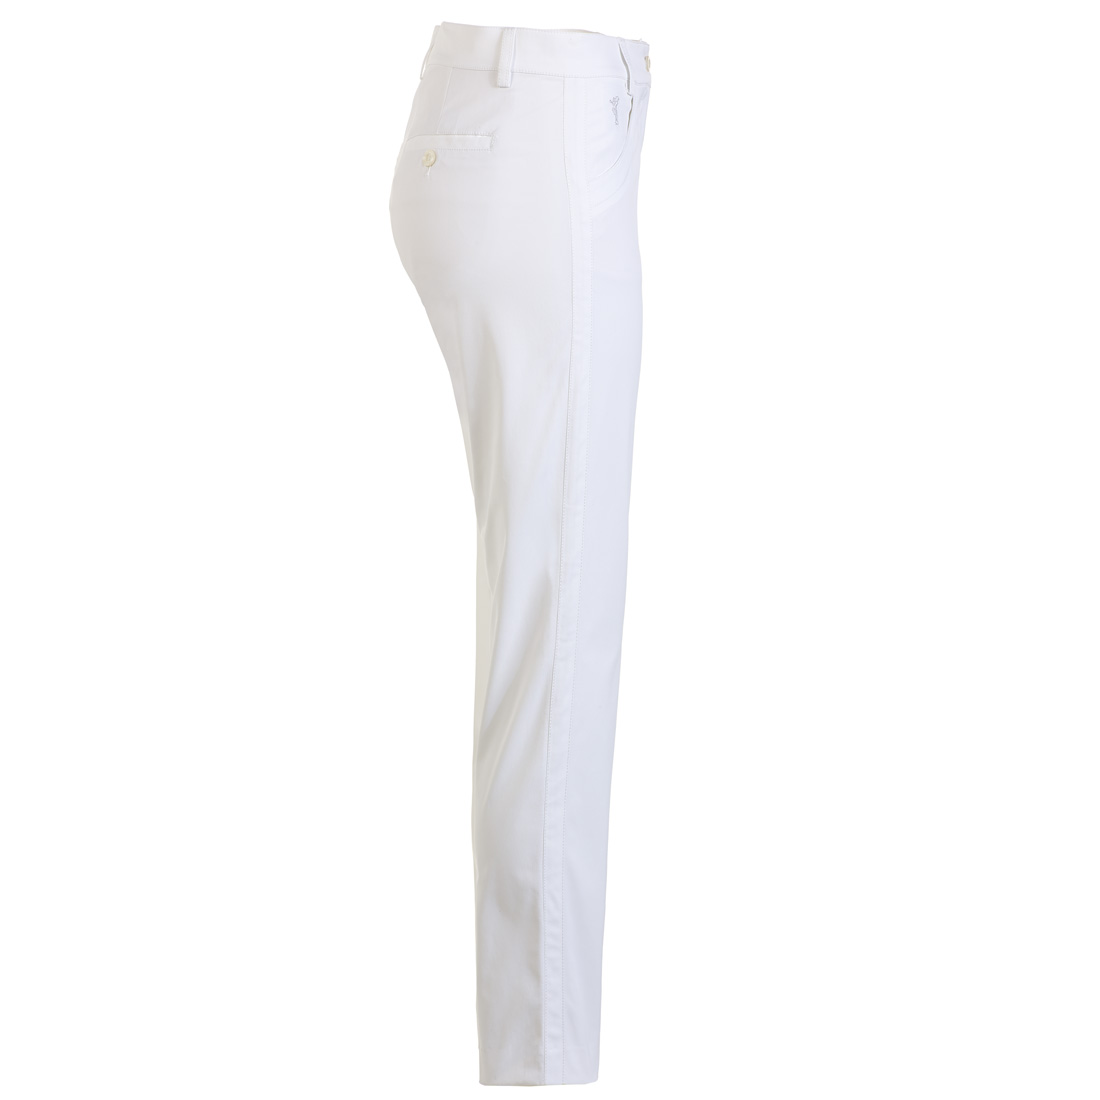 Damen 7/8-Funktions-Stretchhose